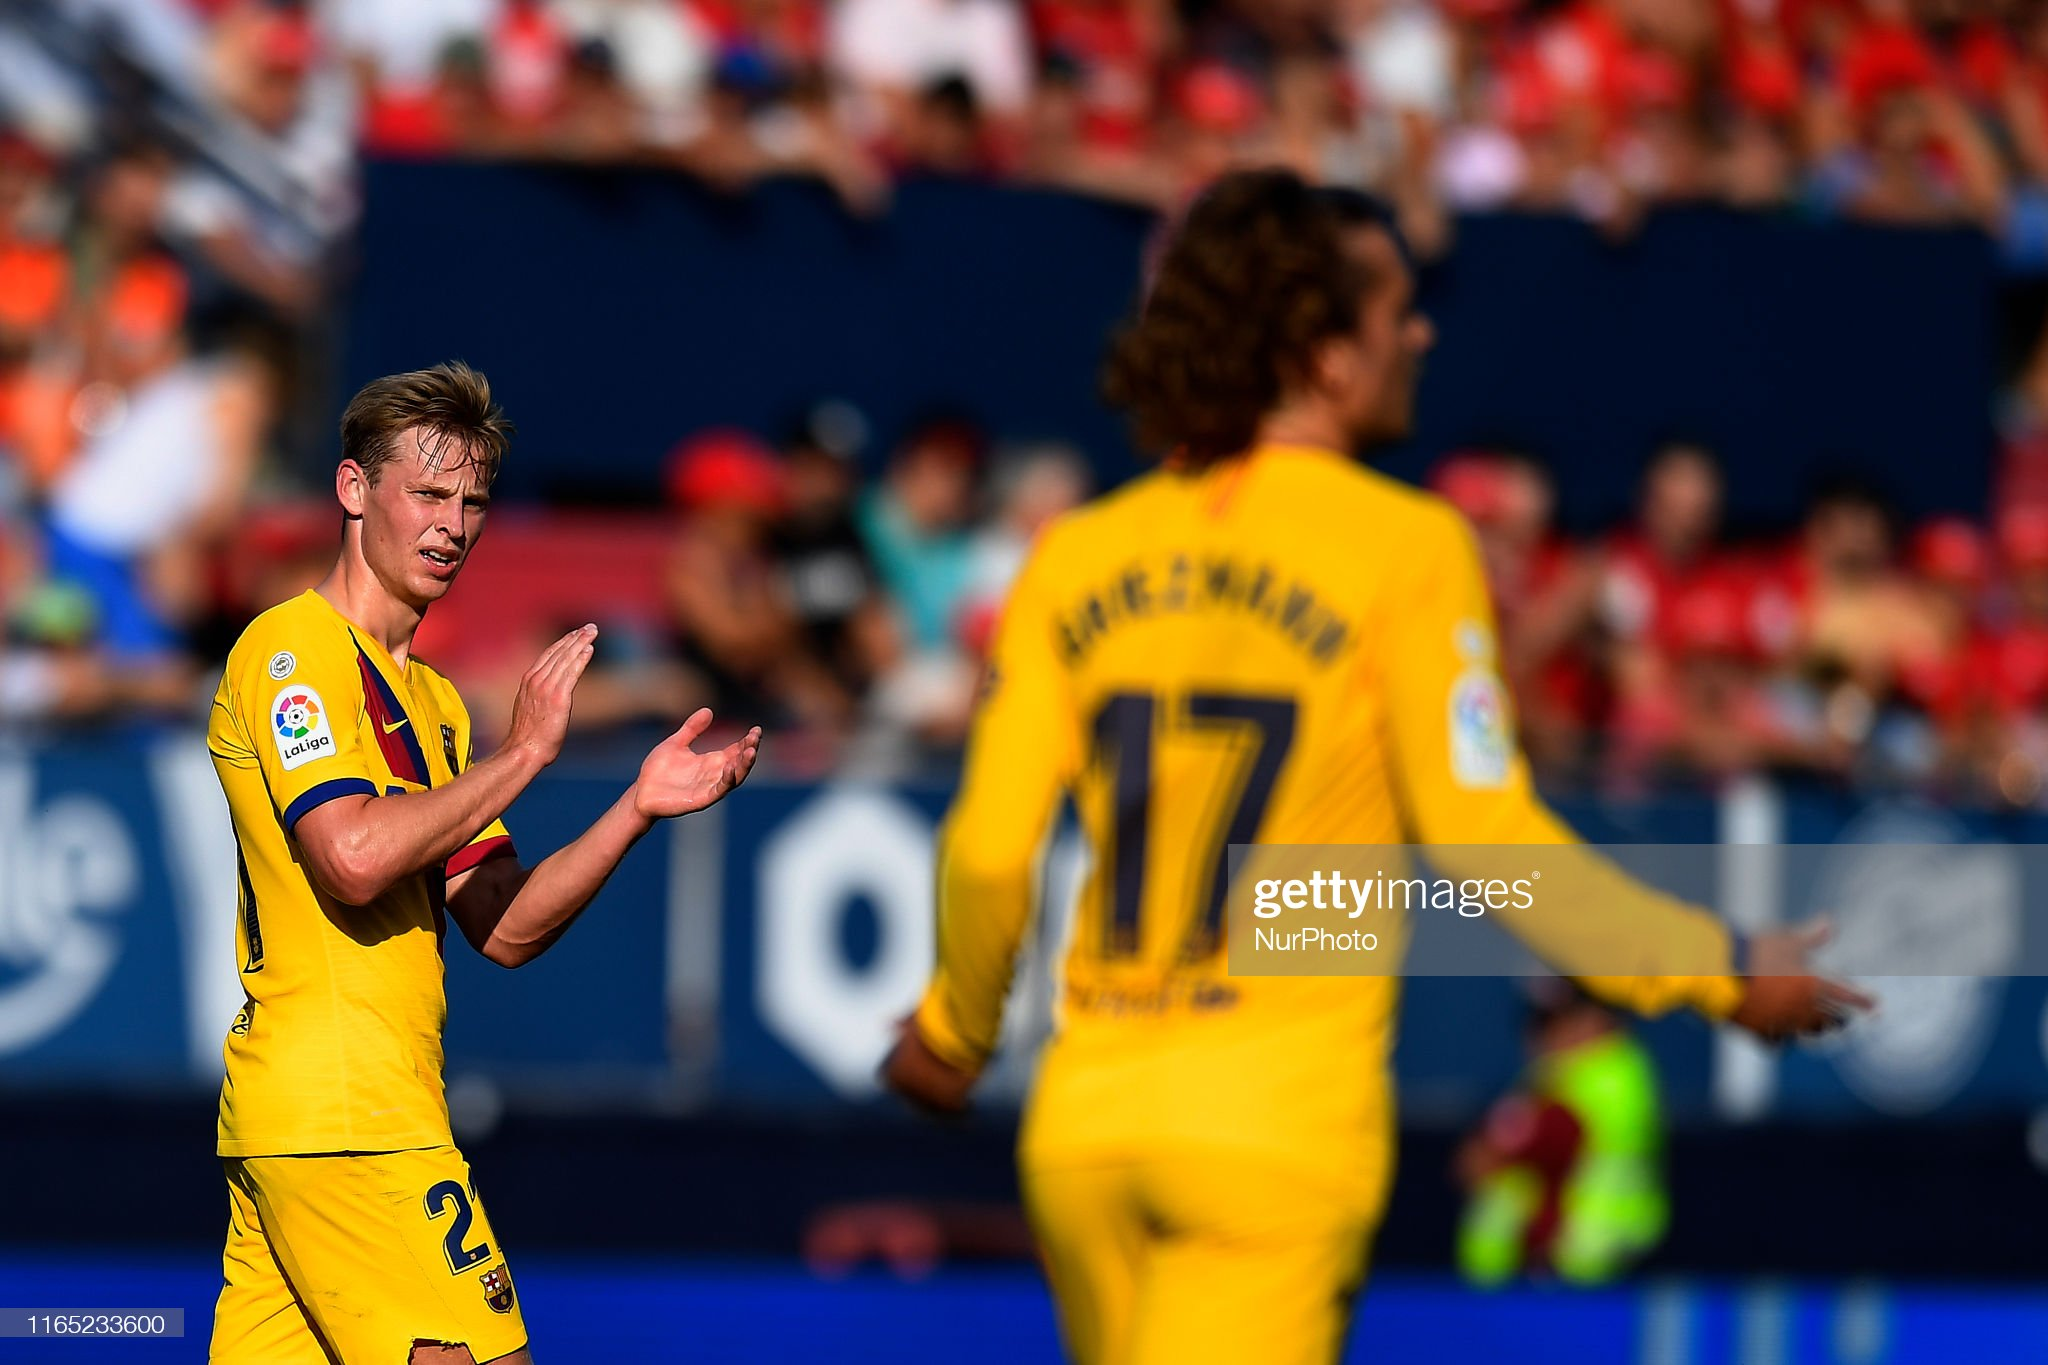 صور مباراة : أوساسونا - برشلونة 2-2 ( 31-08-2019 )  Frenkie-de-jong-applauds-antoine-griezmann-of-barcelona-during-the-picture-id1165233600?s=2048x2048